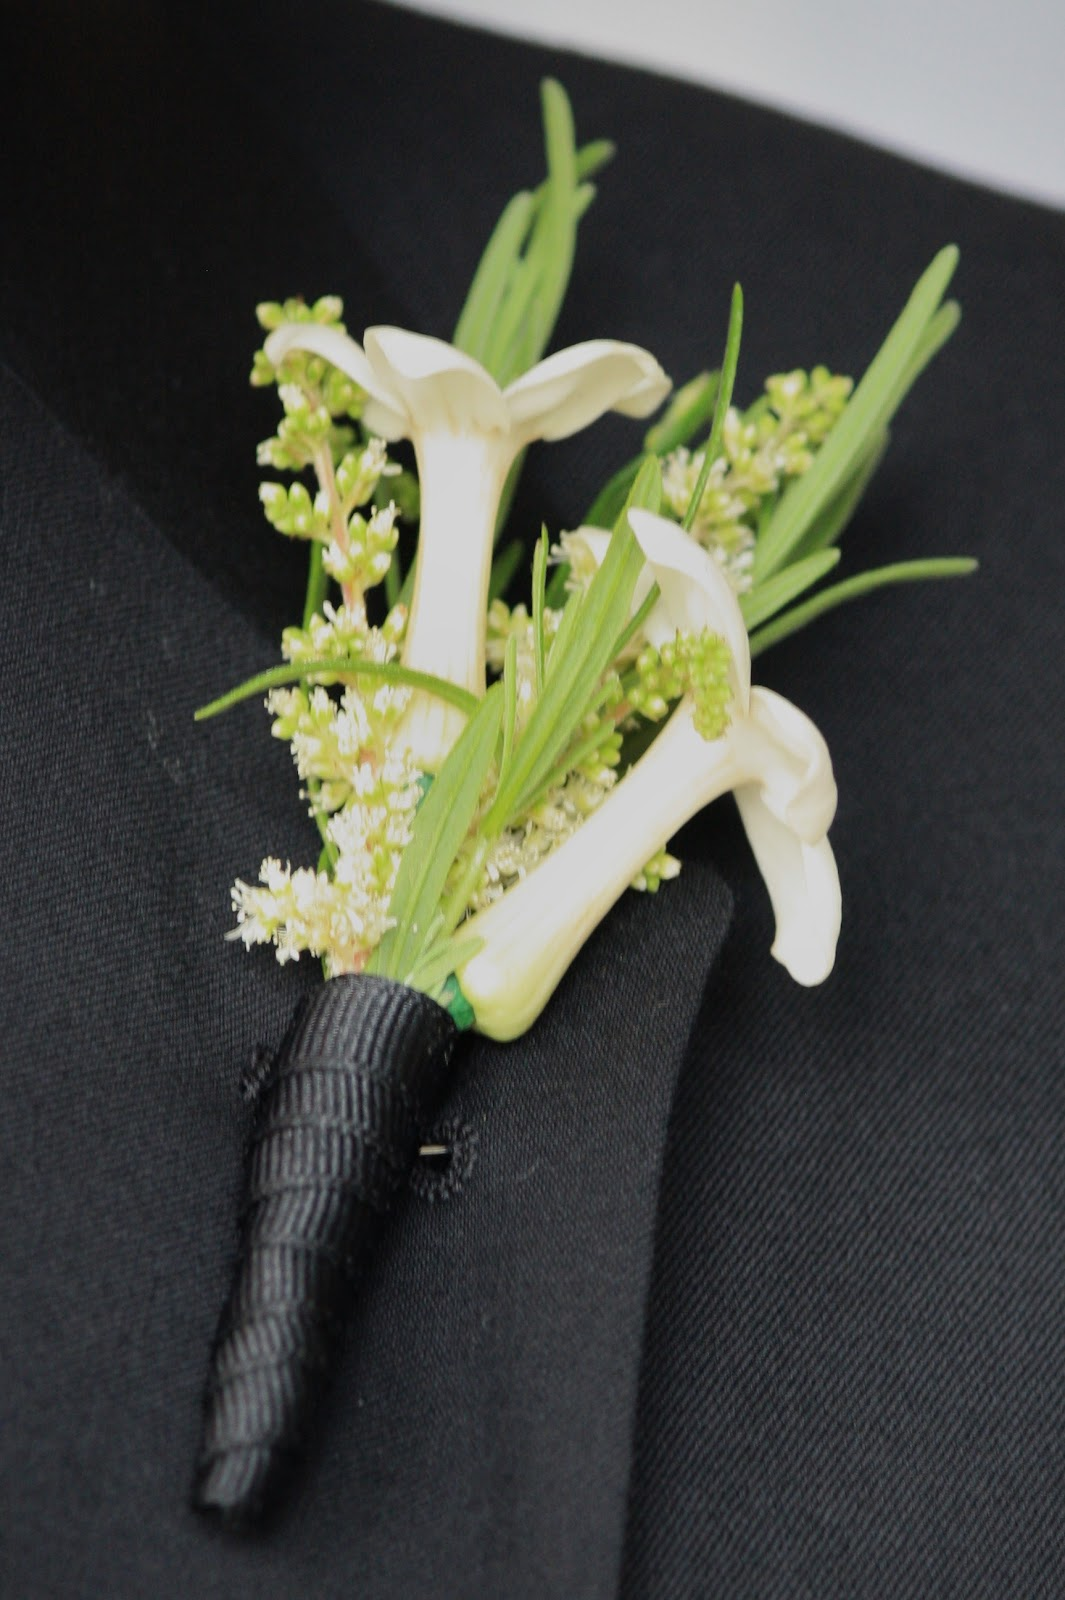 Stephanotis Boutonniere - Boutonnieres - Wedding Flowers - Groom - Usher - Best Man - Groomsmen - Ushers - Groom's Boutonniere